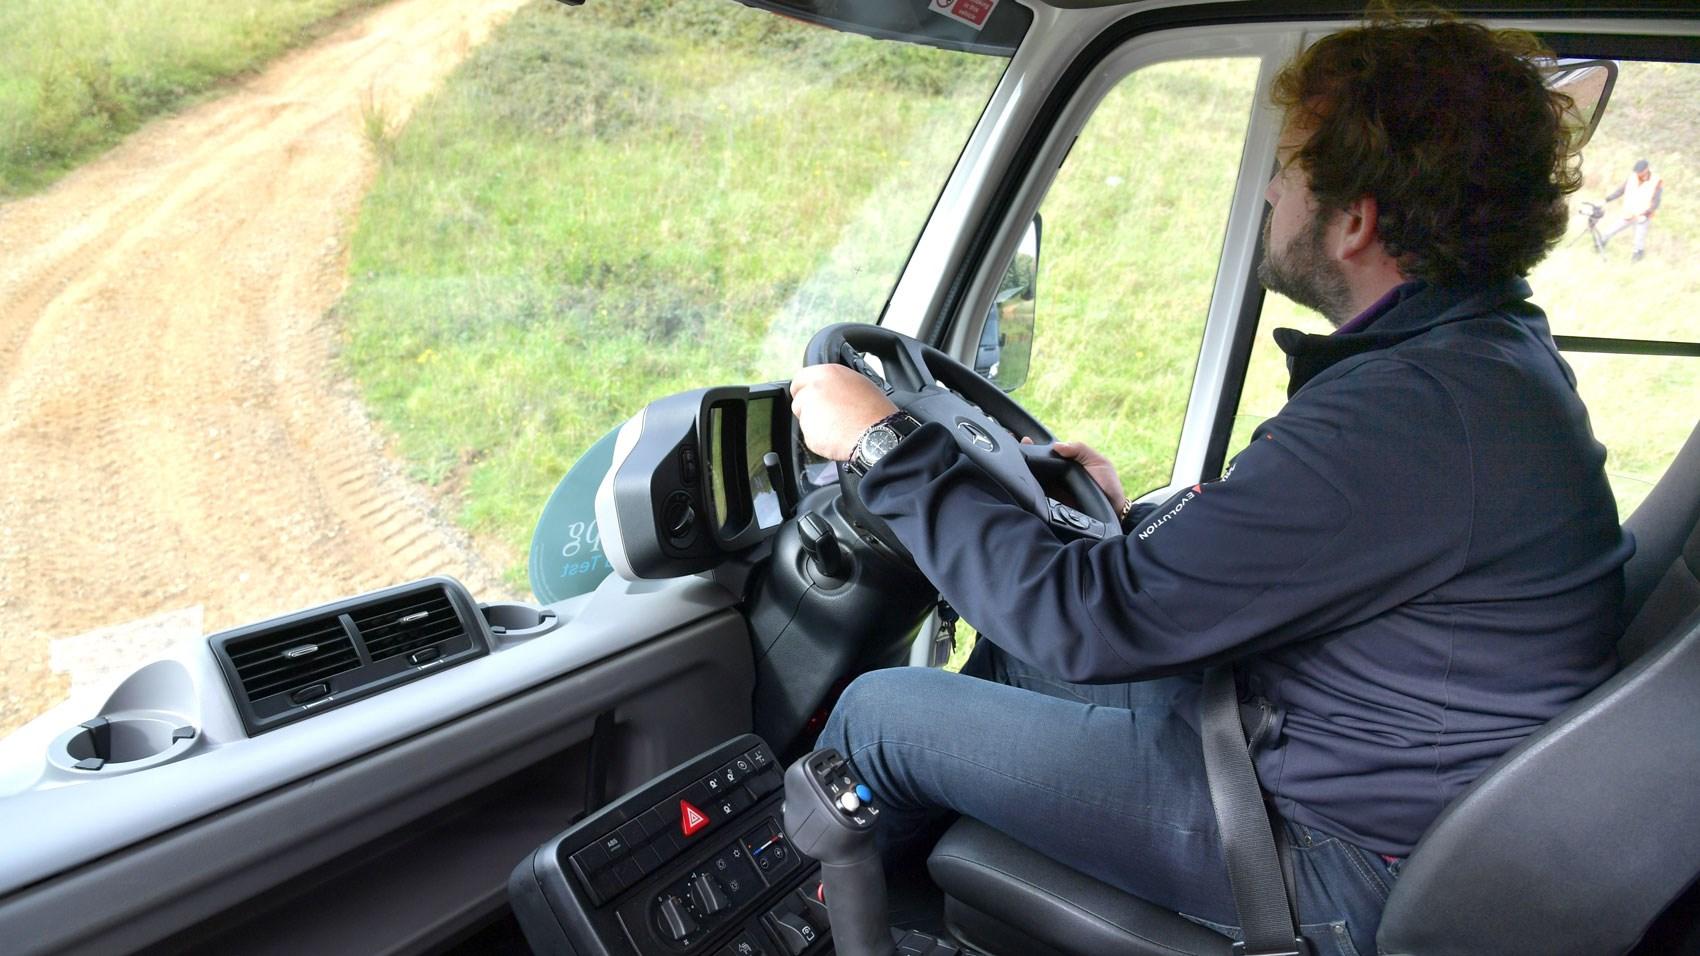 Mercedes Unimog Gareth driving